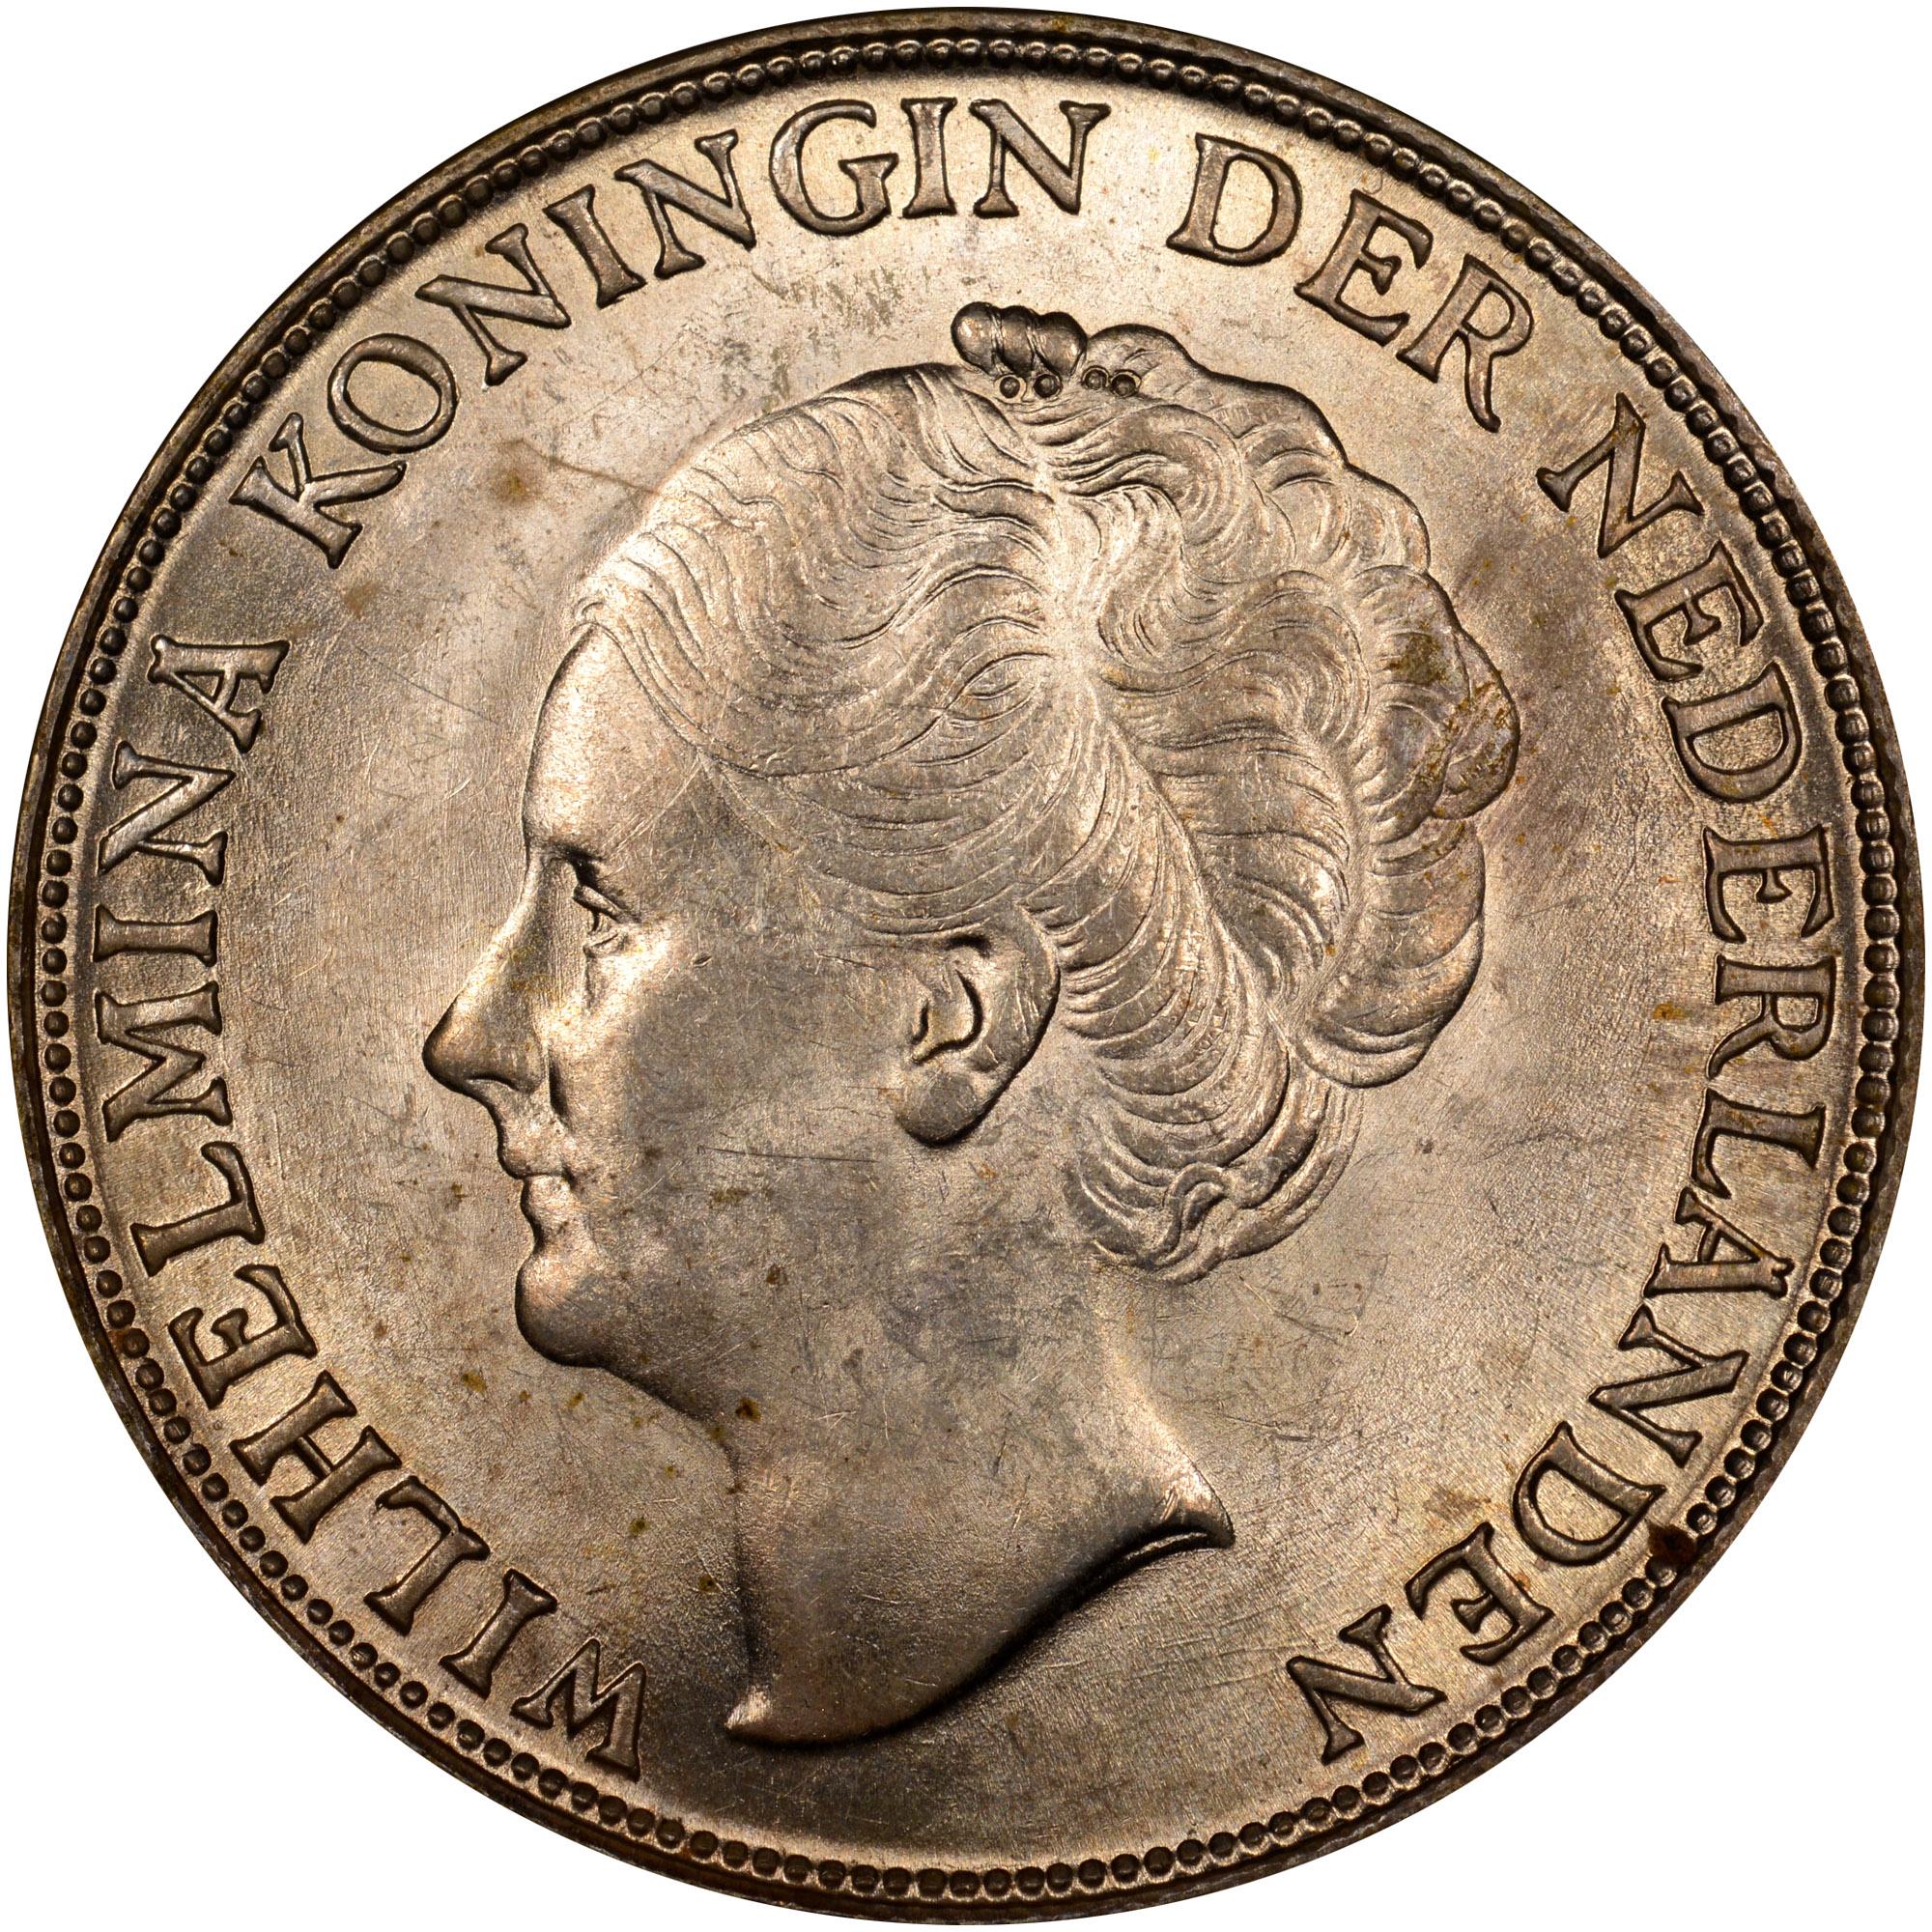 1944 Curacao Gulden obverse